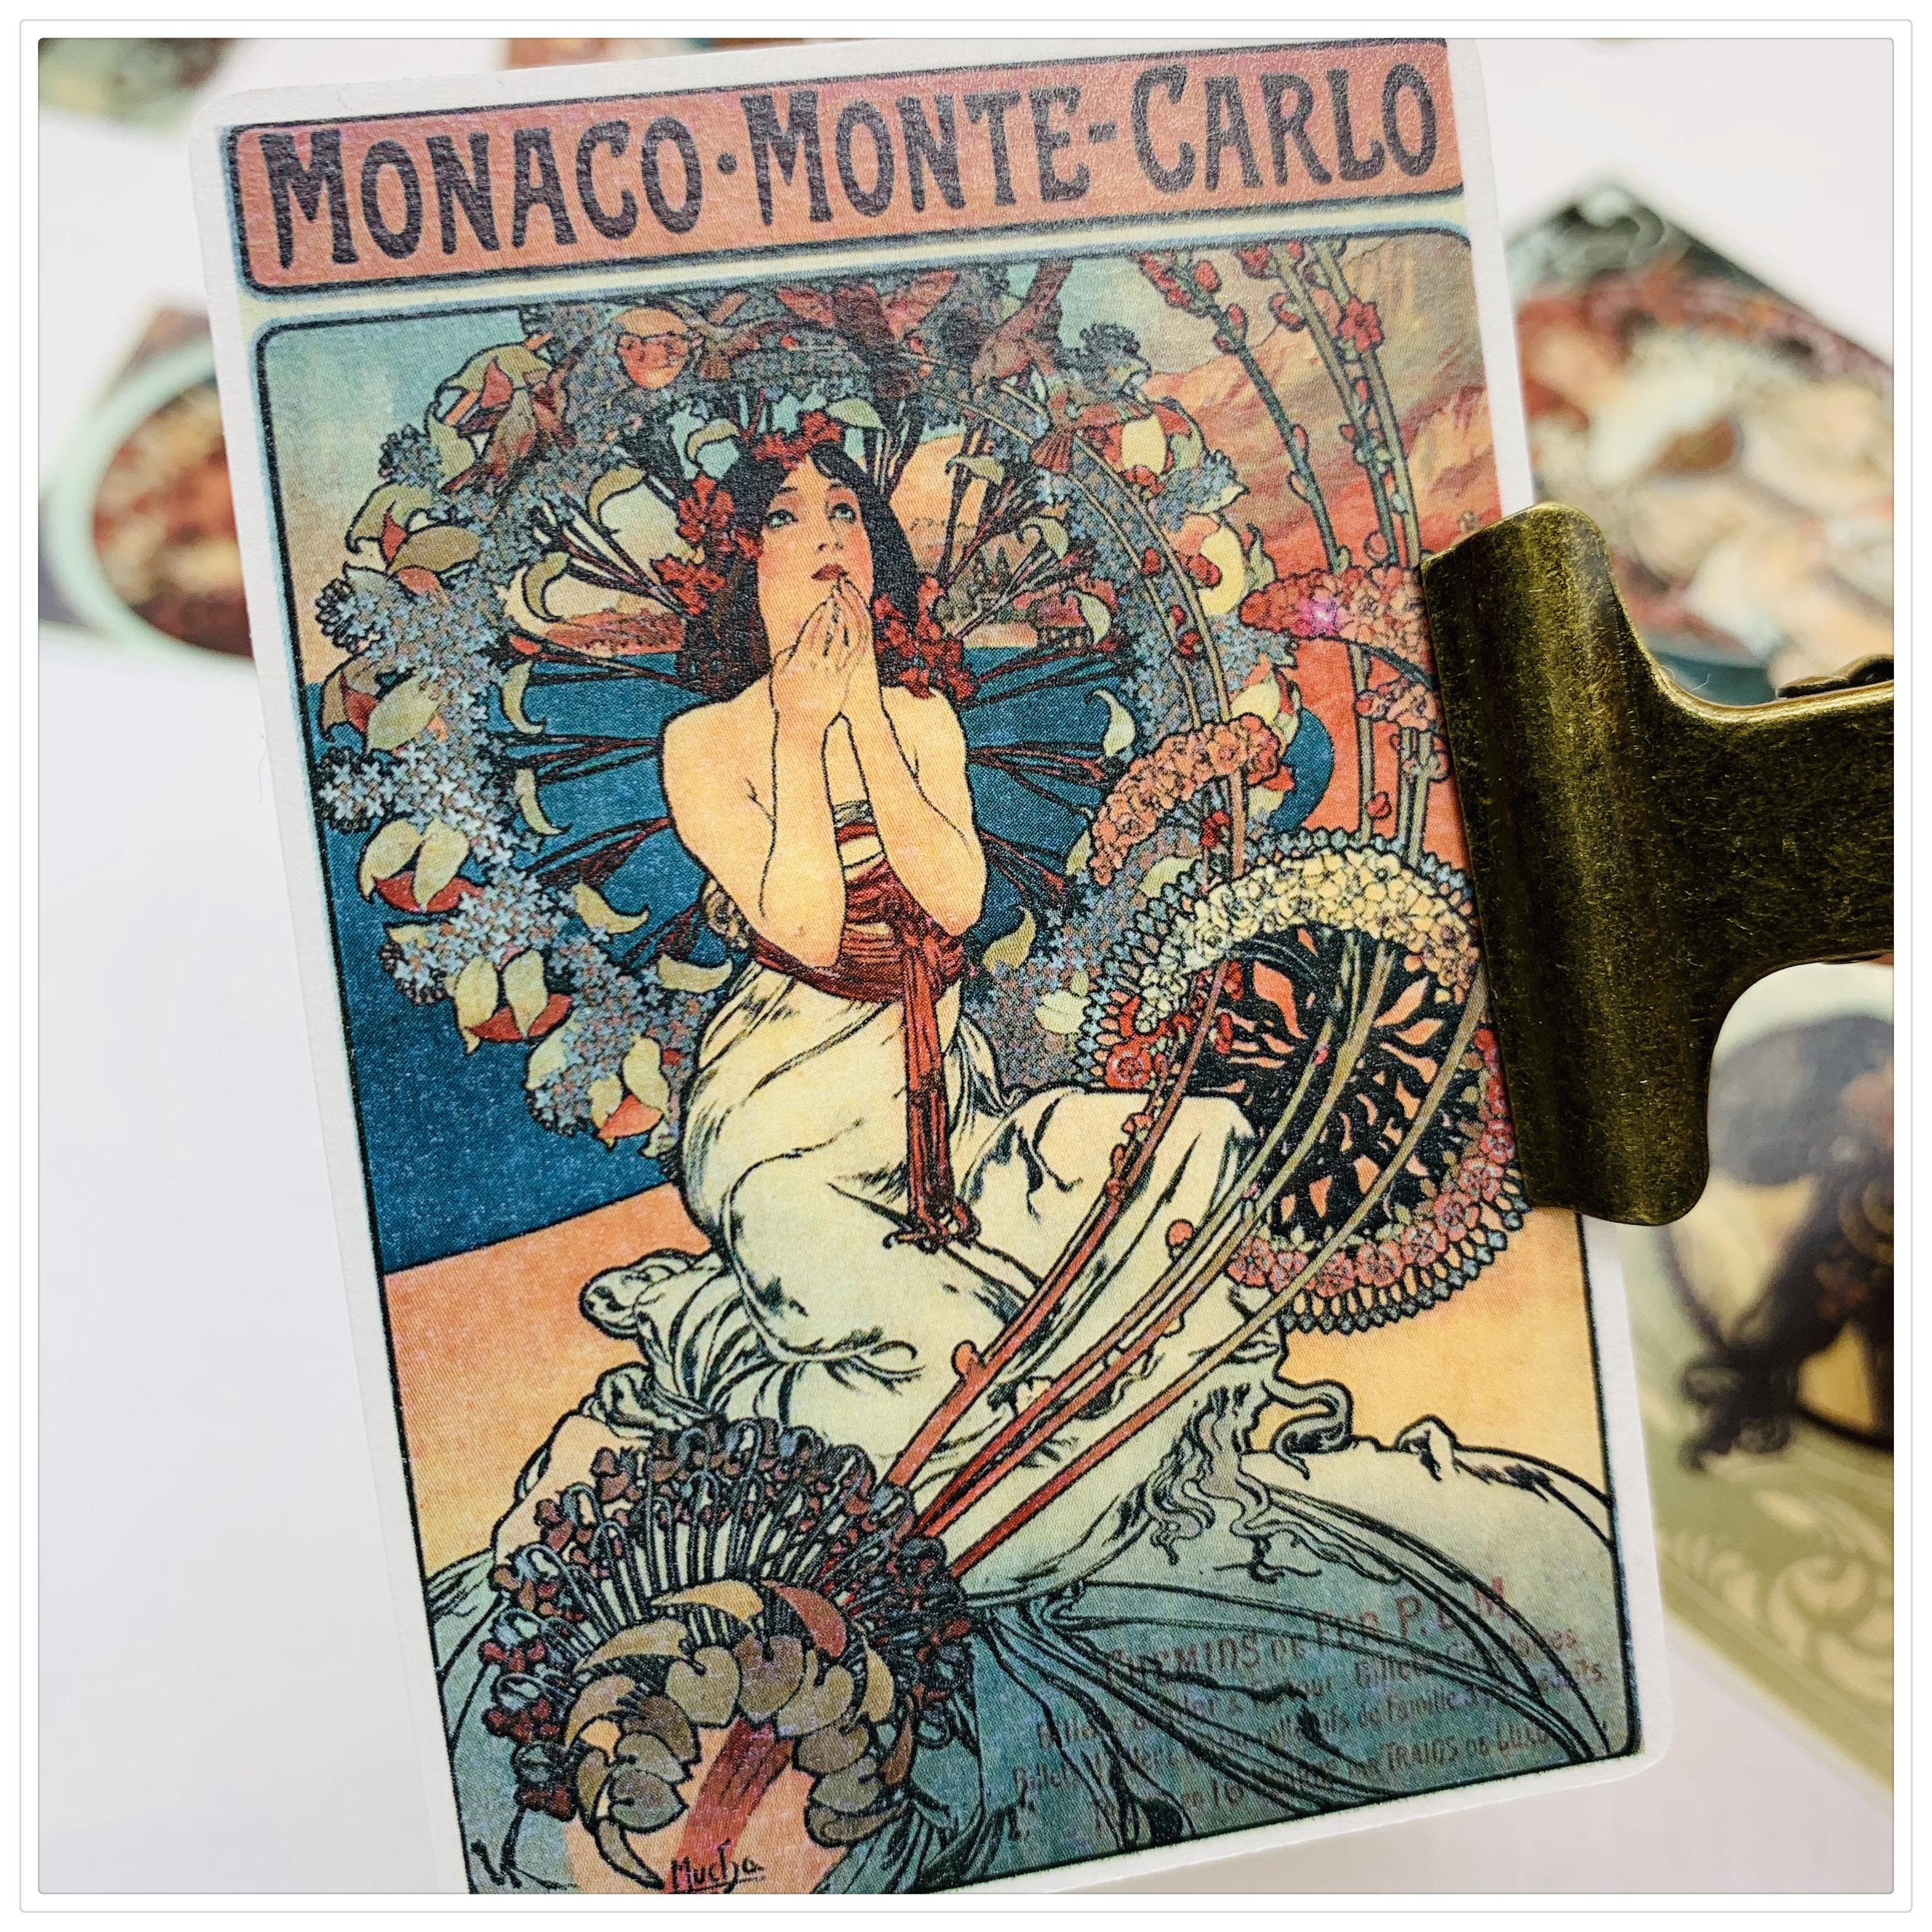 17Pcs/Set Vintage European Art Painting Sticker DIY Craft Scrapbooking Album Junk Journal Happy Planner Decorative Stickers